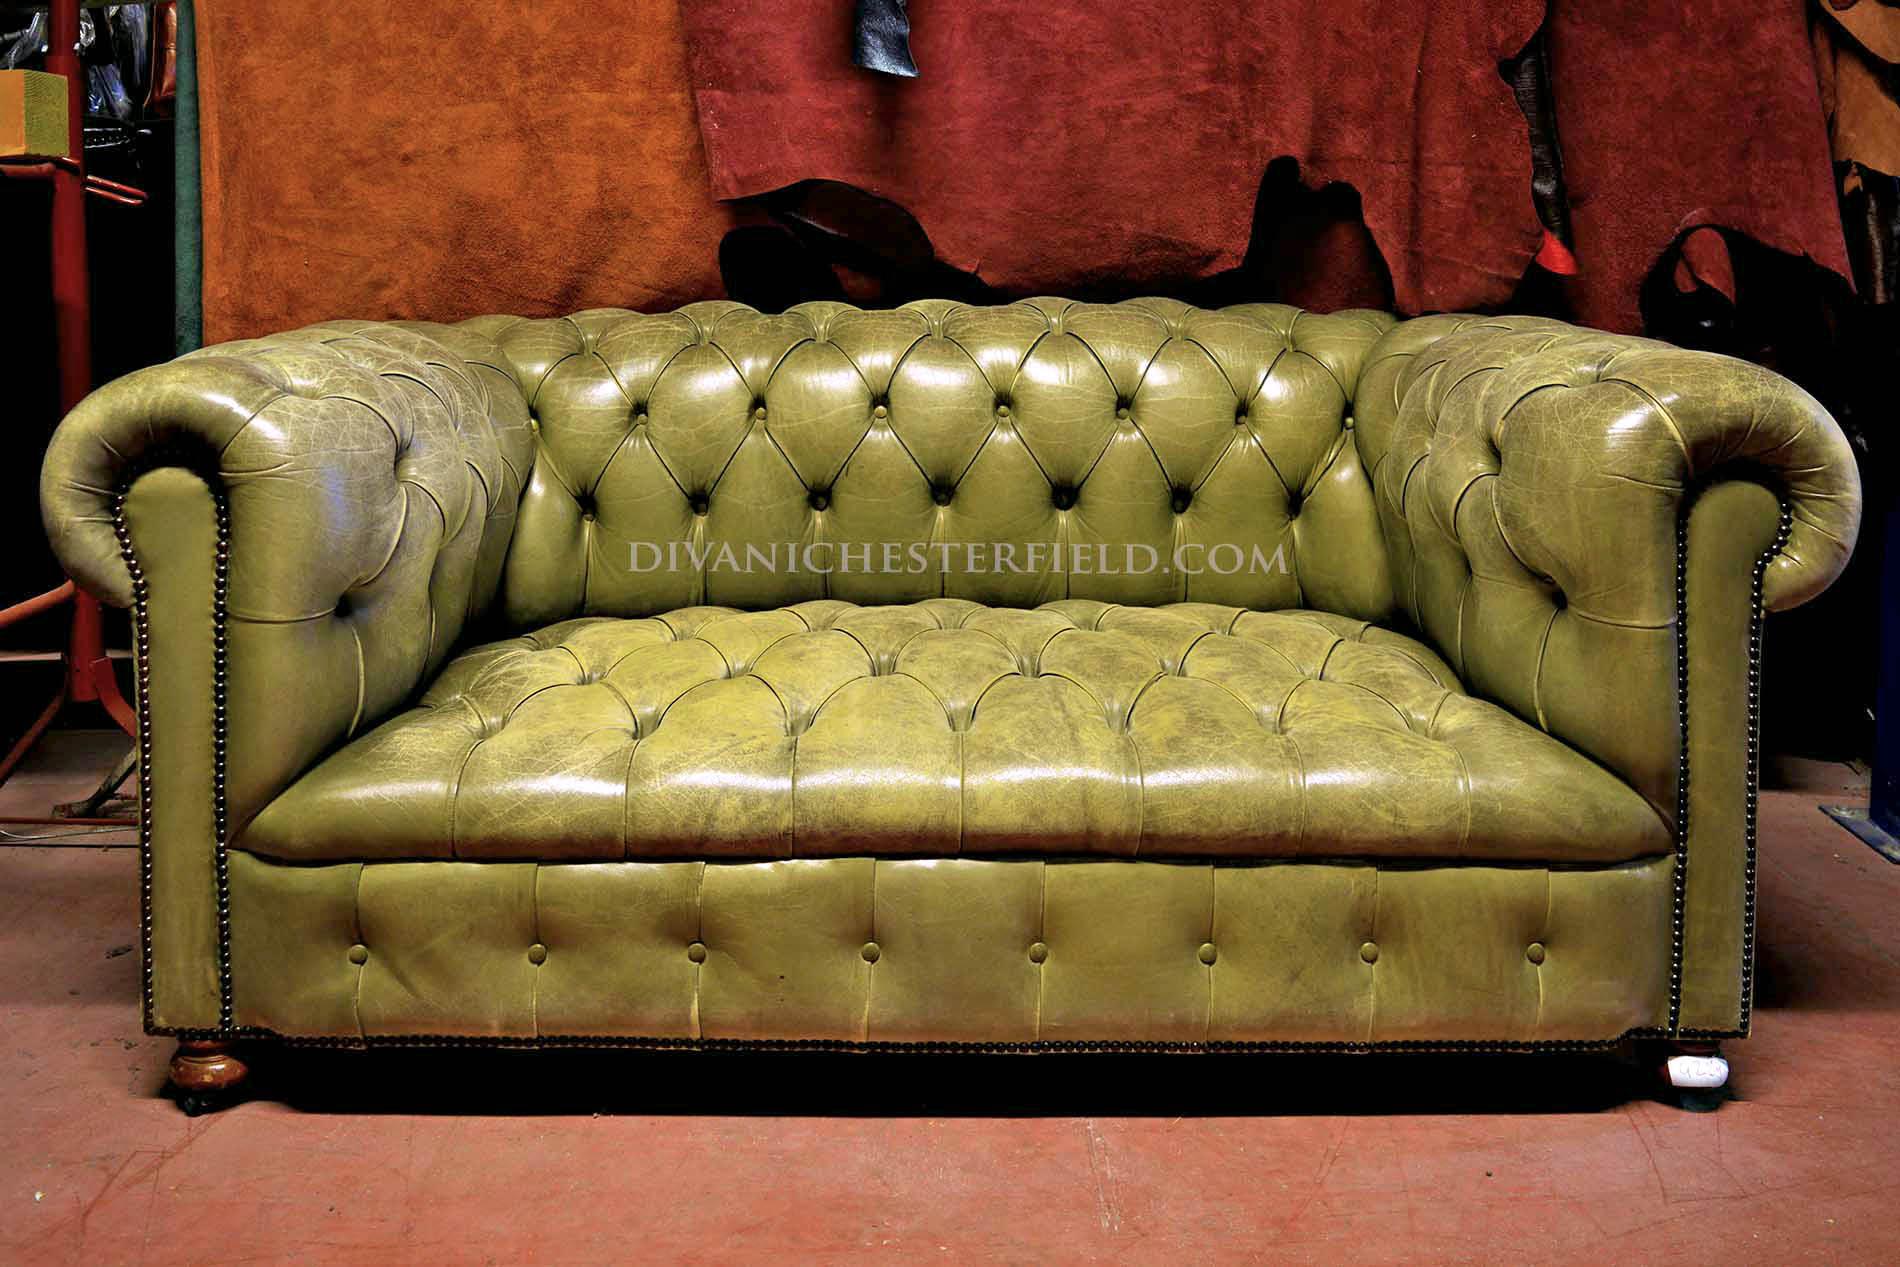 Divani chesterfield usati in pelle vintage originali inglesi for Divano verde salvia